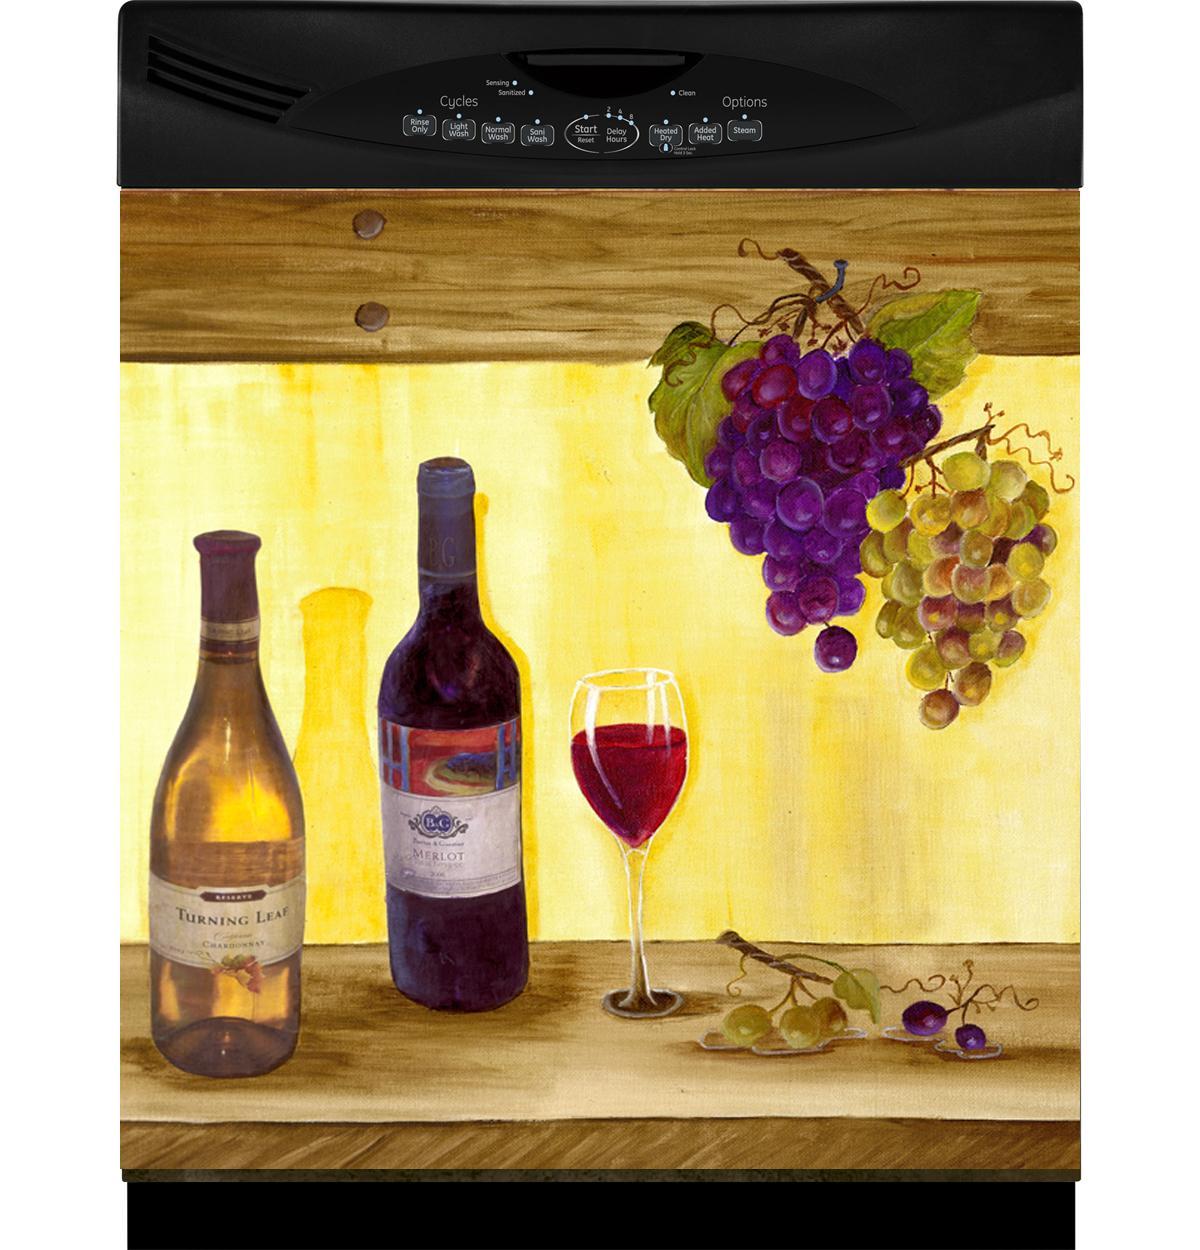 Appliance Art 'The Harvest' Dishwasher Cover